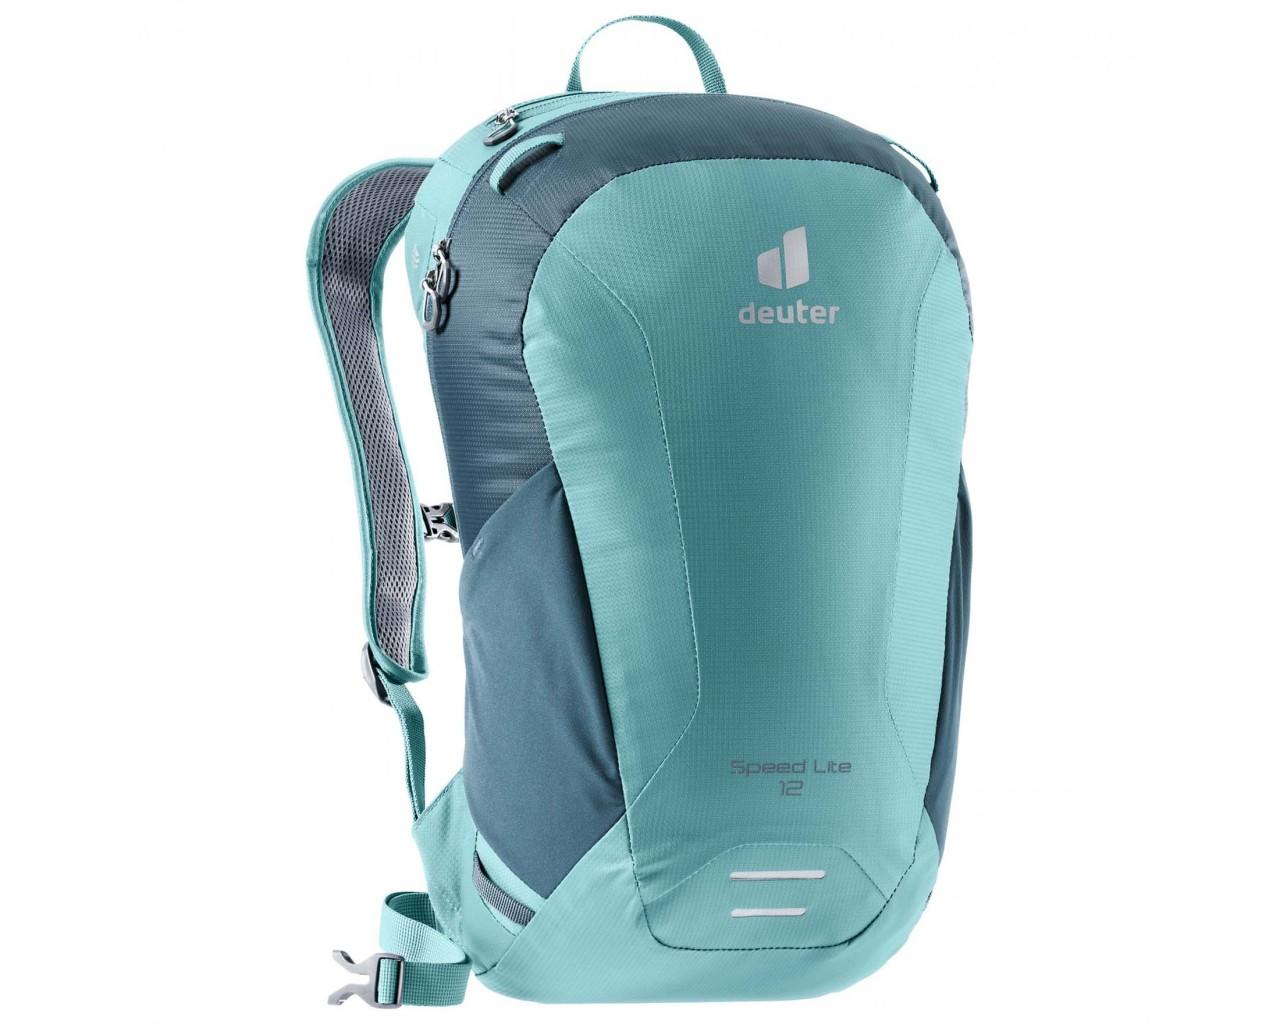 Deuter Speed Lite 12 litres Backpack PFC-free   dustblue-arctic